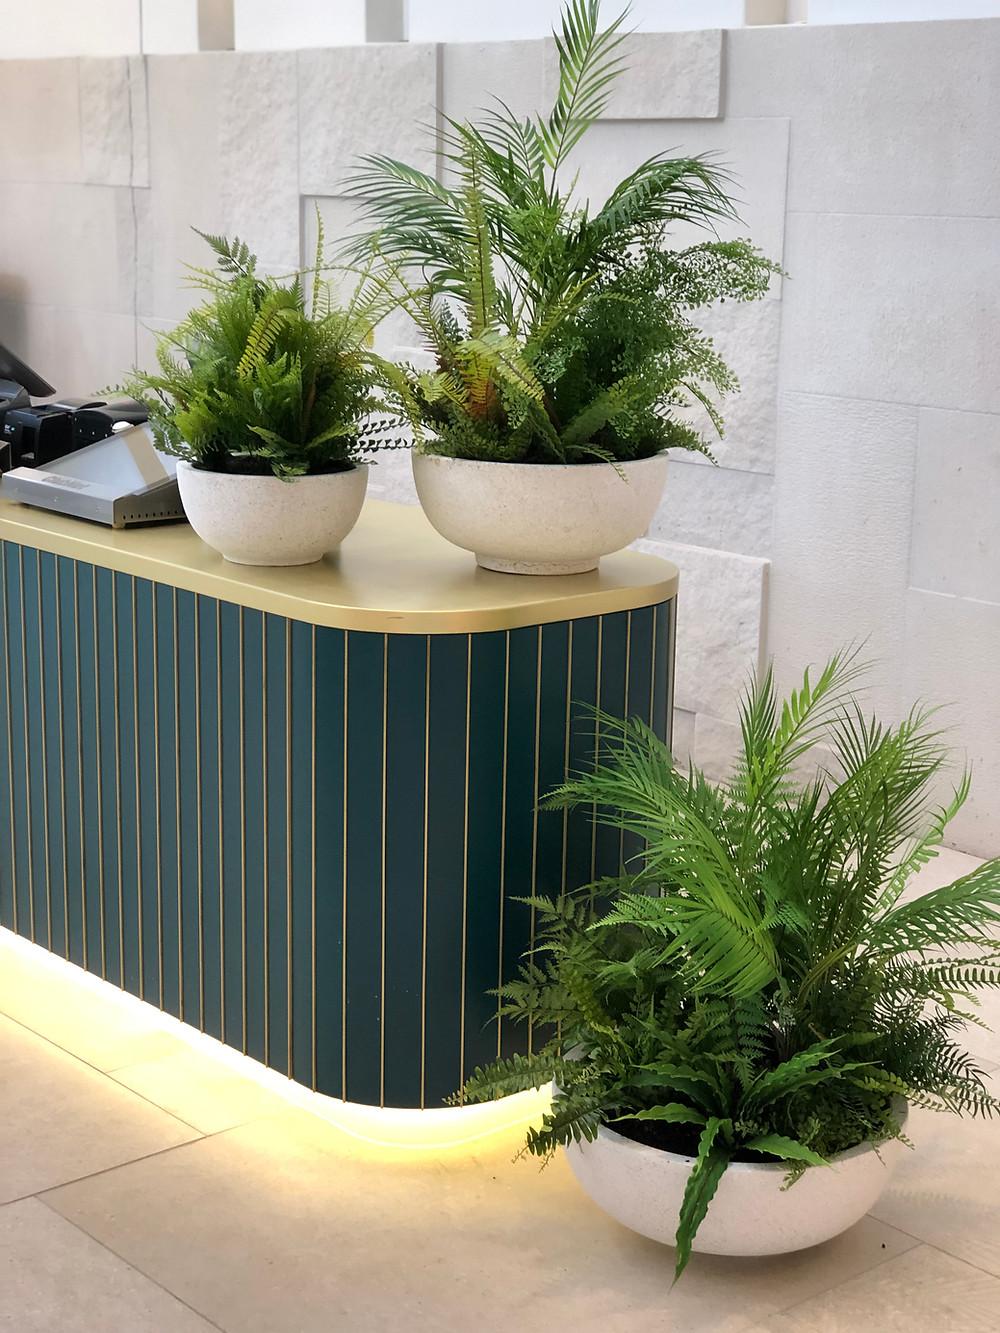 Tropical greenery bowls @ Strathfield Sports Club